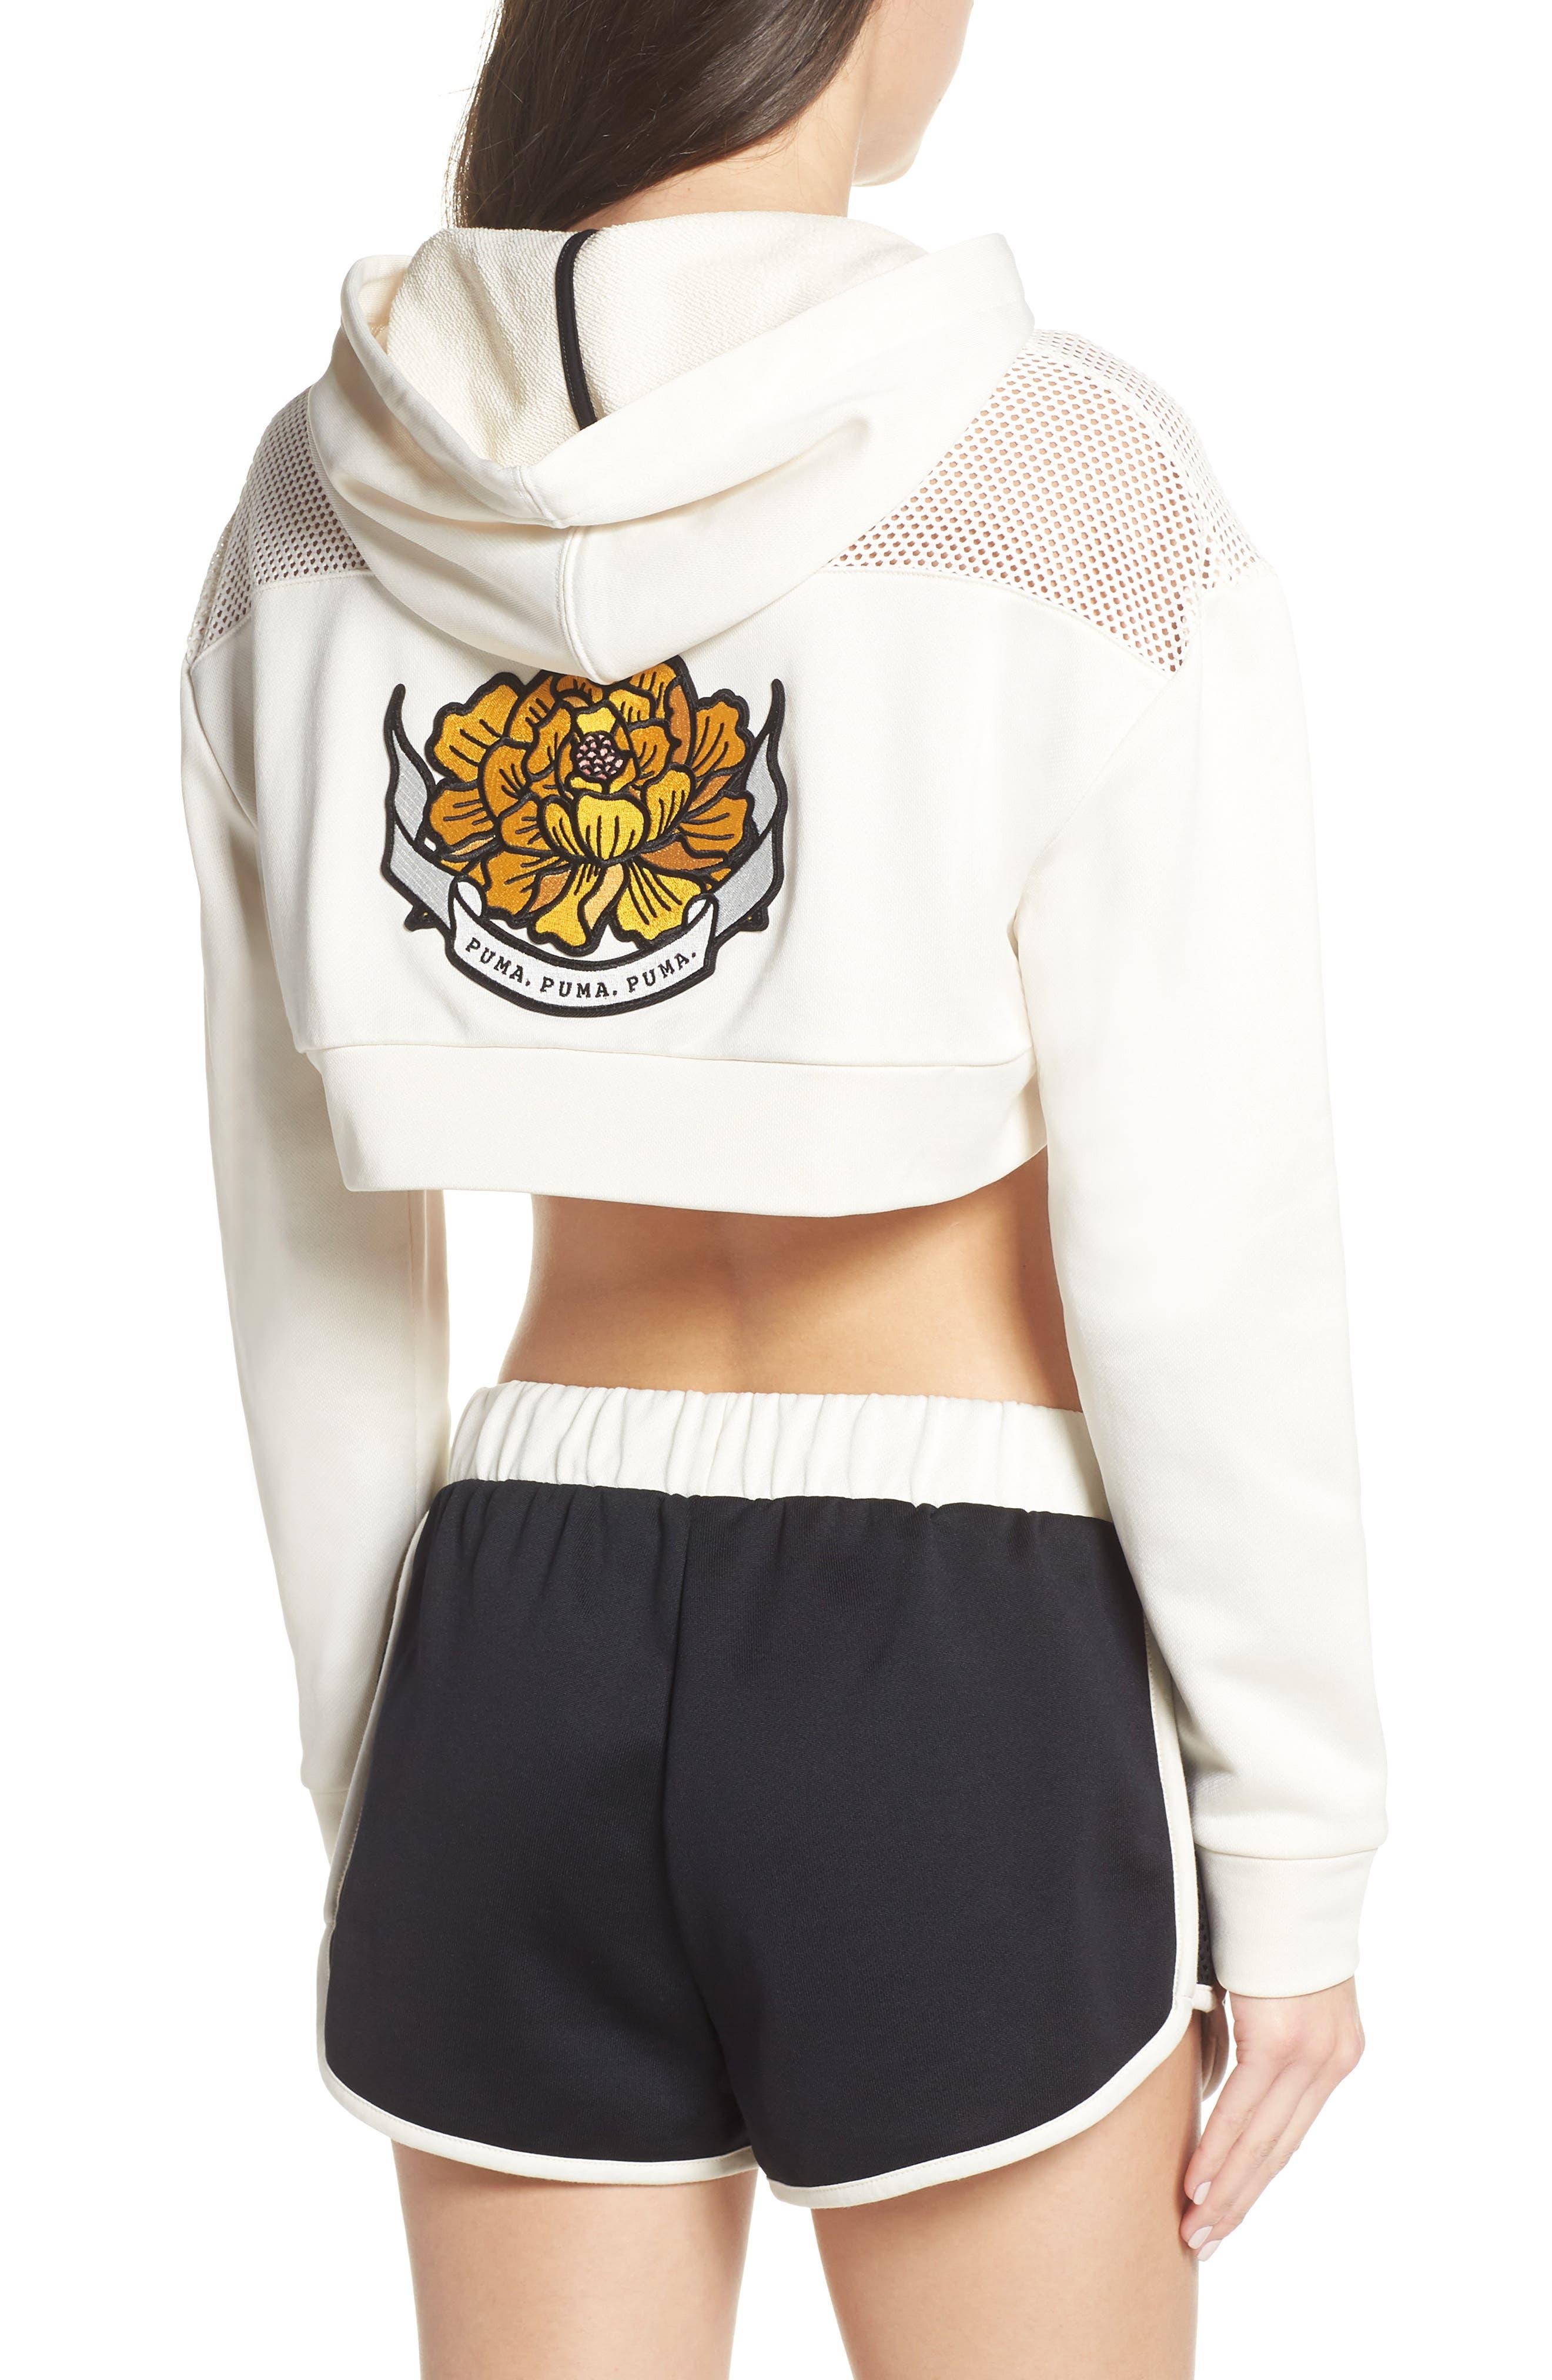 PUMA, Flourish Crop Hooded Sweatshirt, Alternate thumbnail 2, color, WHISPER WHITE-PUMA BLACK